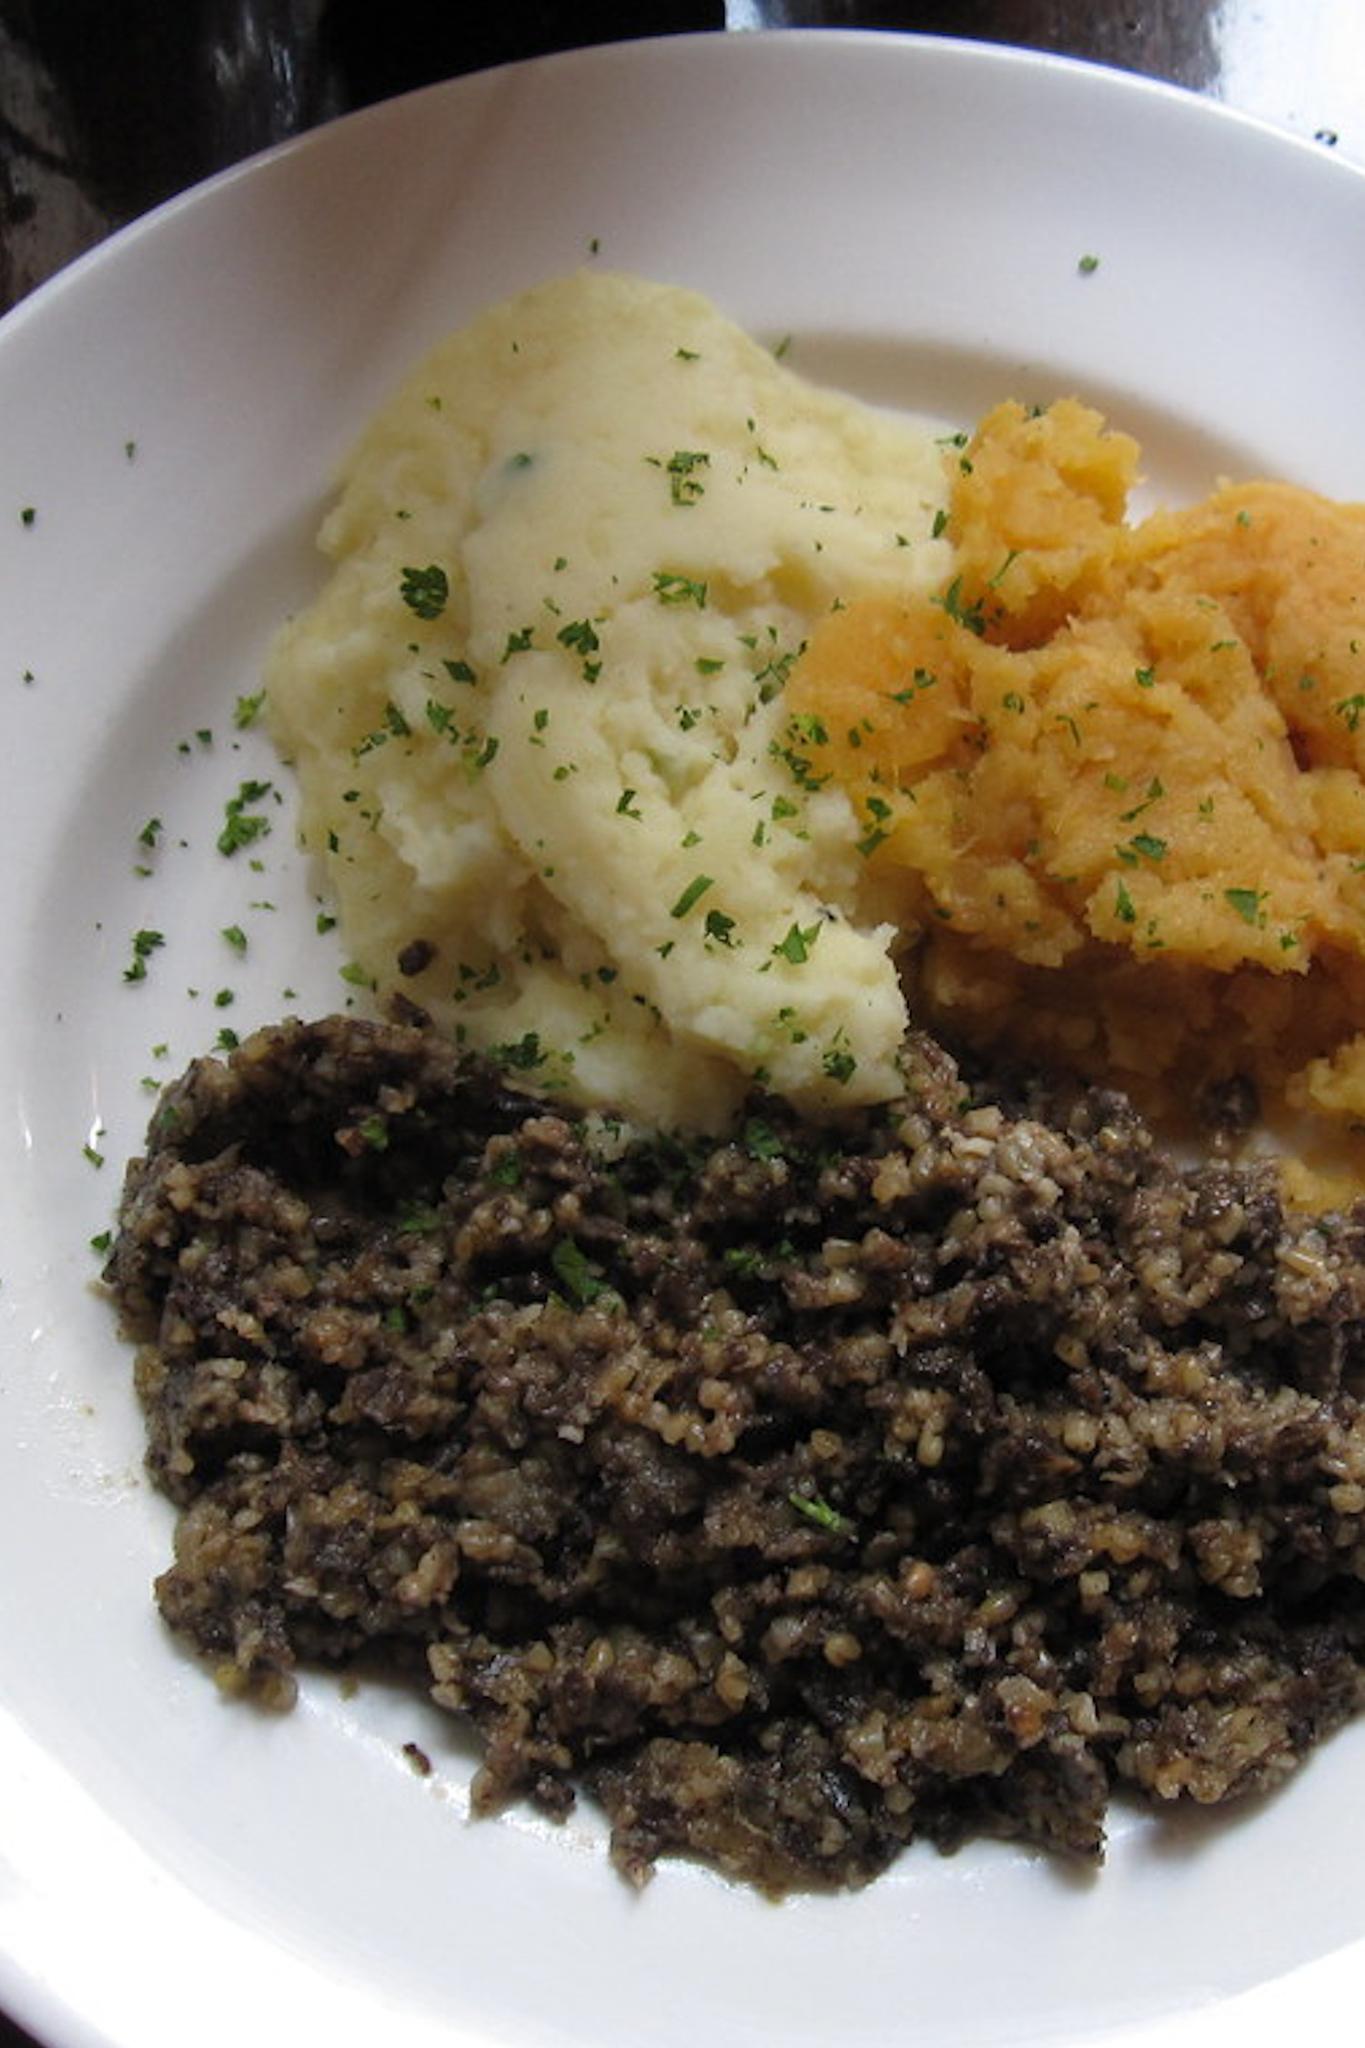 Scottish foods haggis, potatoes and turnip on a plate.